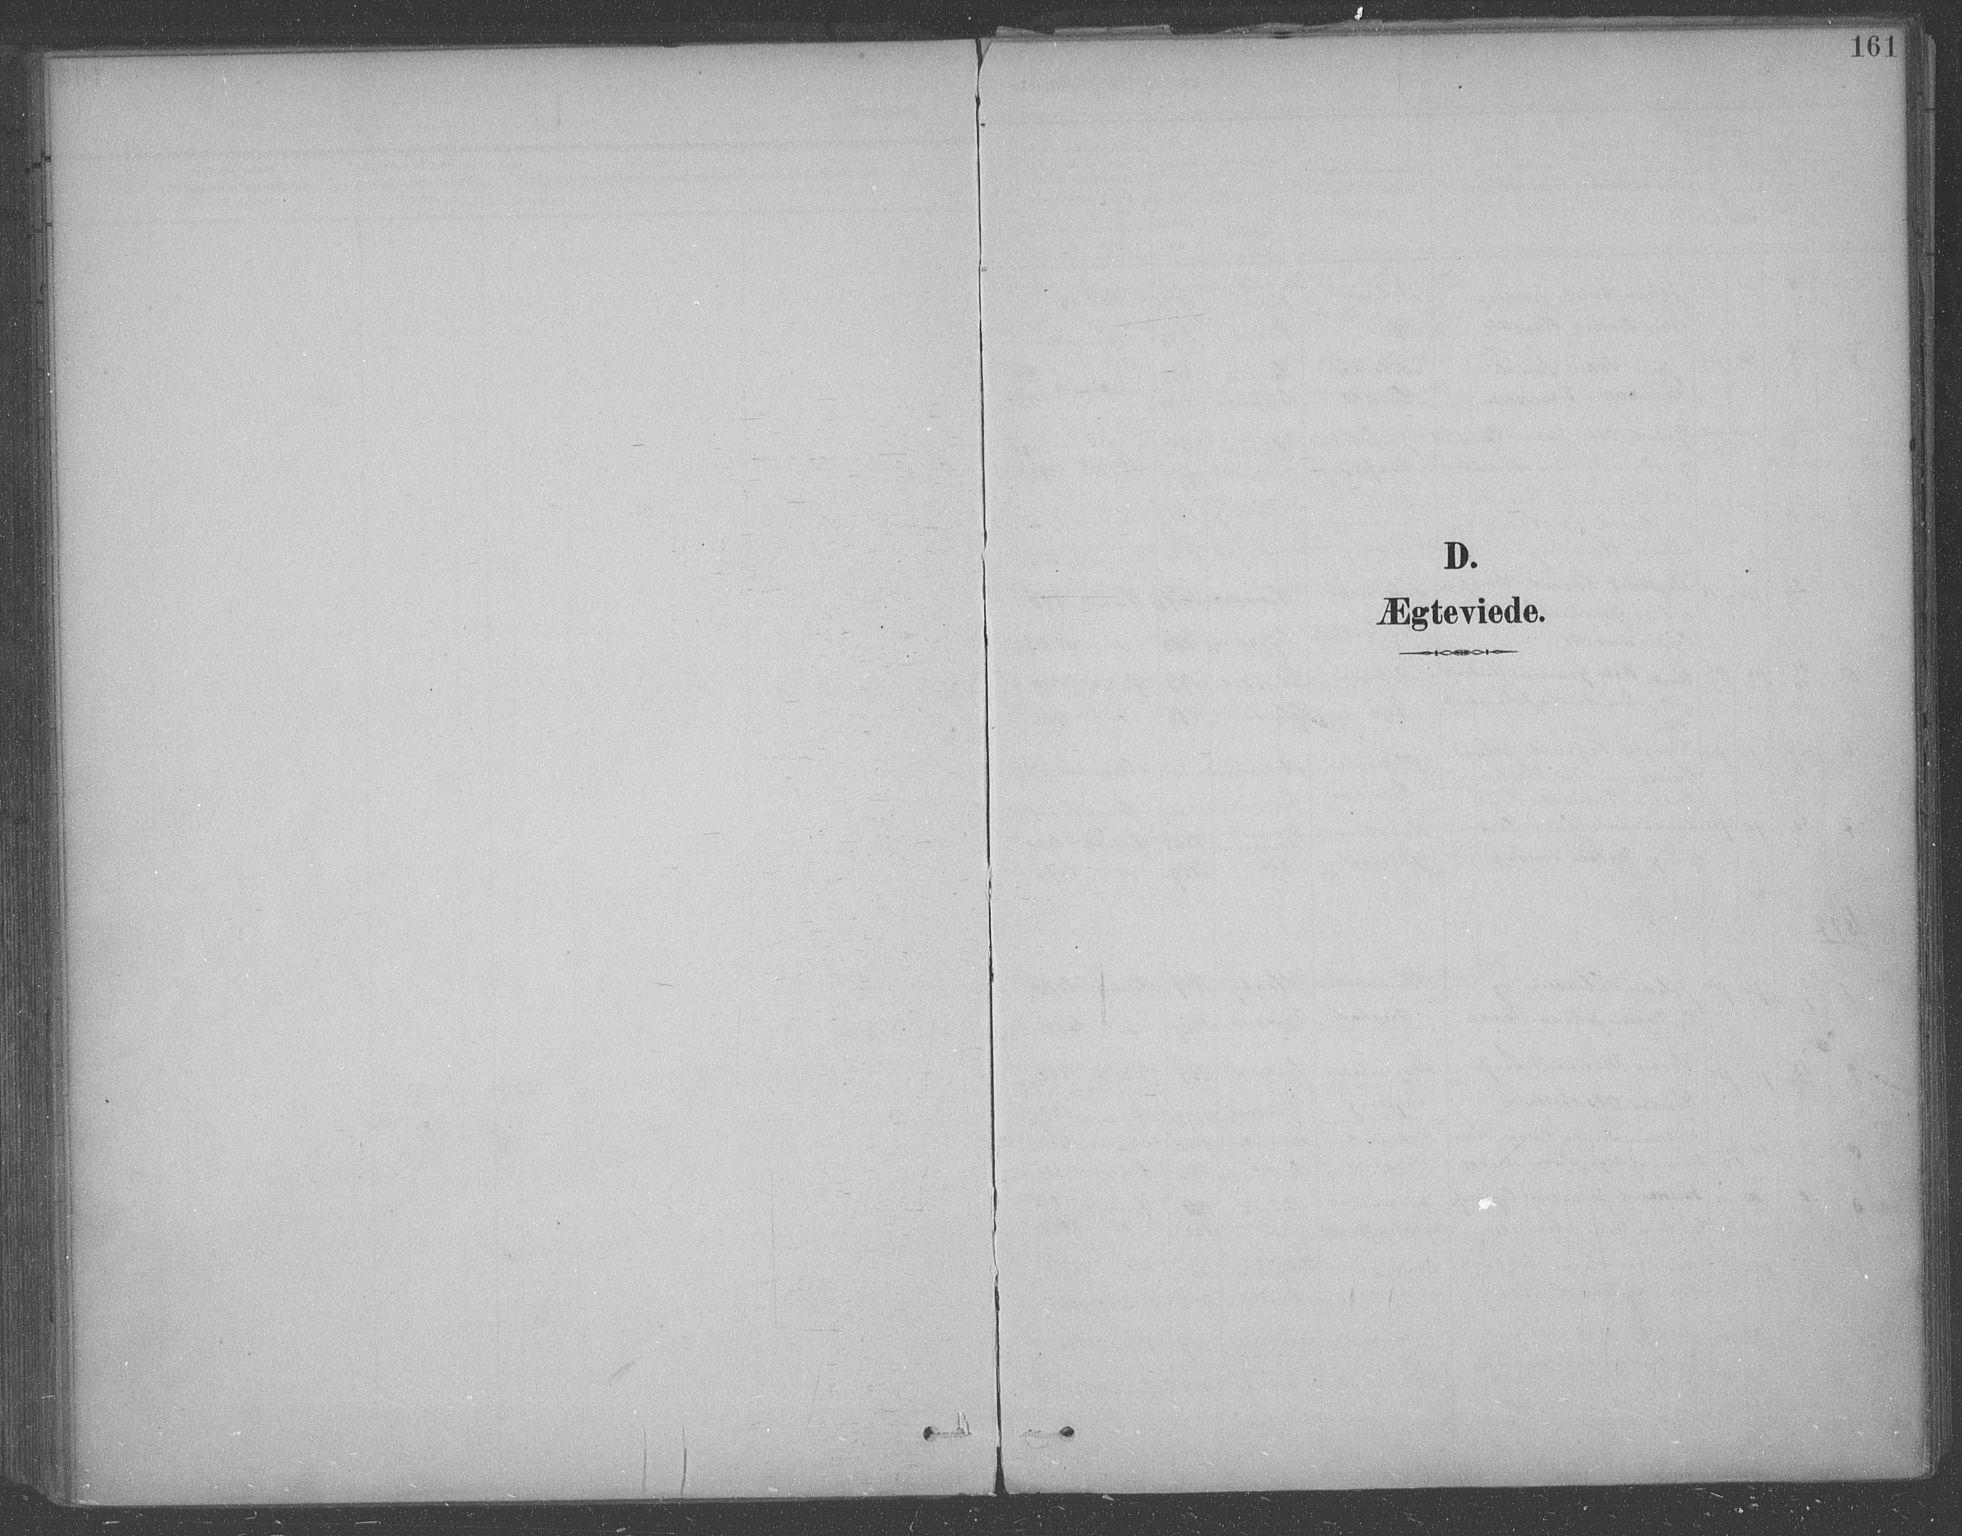 SAO, Aremark prestekontor Kirkebøker, F/Fb/L0005: Ministerialbok nr. II 5, 1895-1919, s. 161